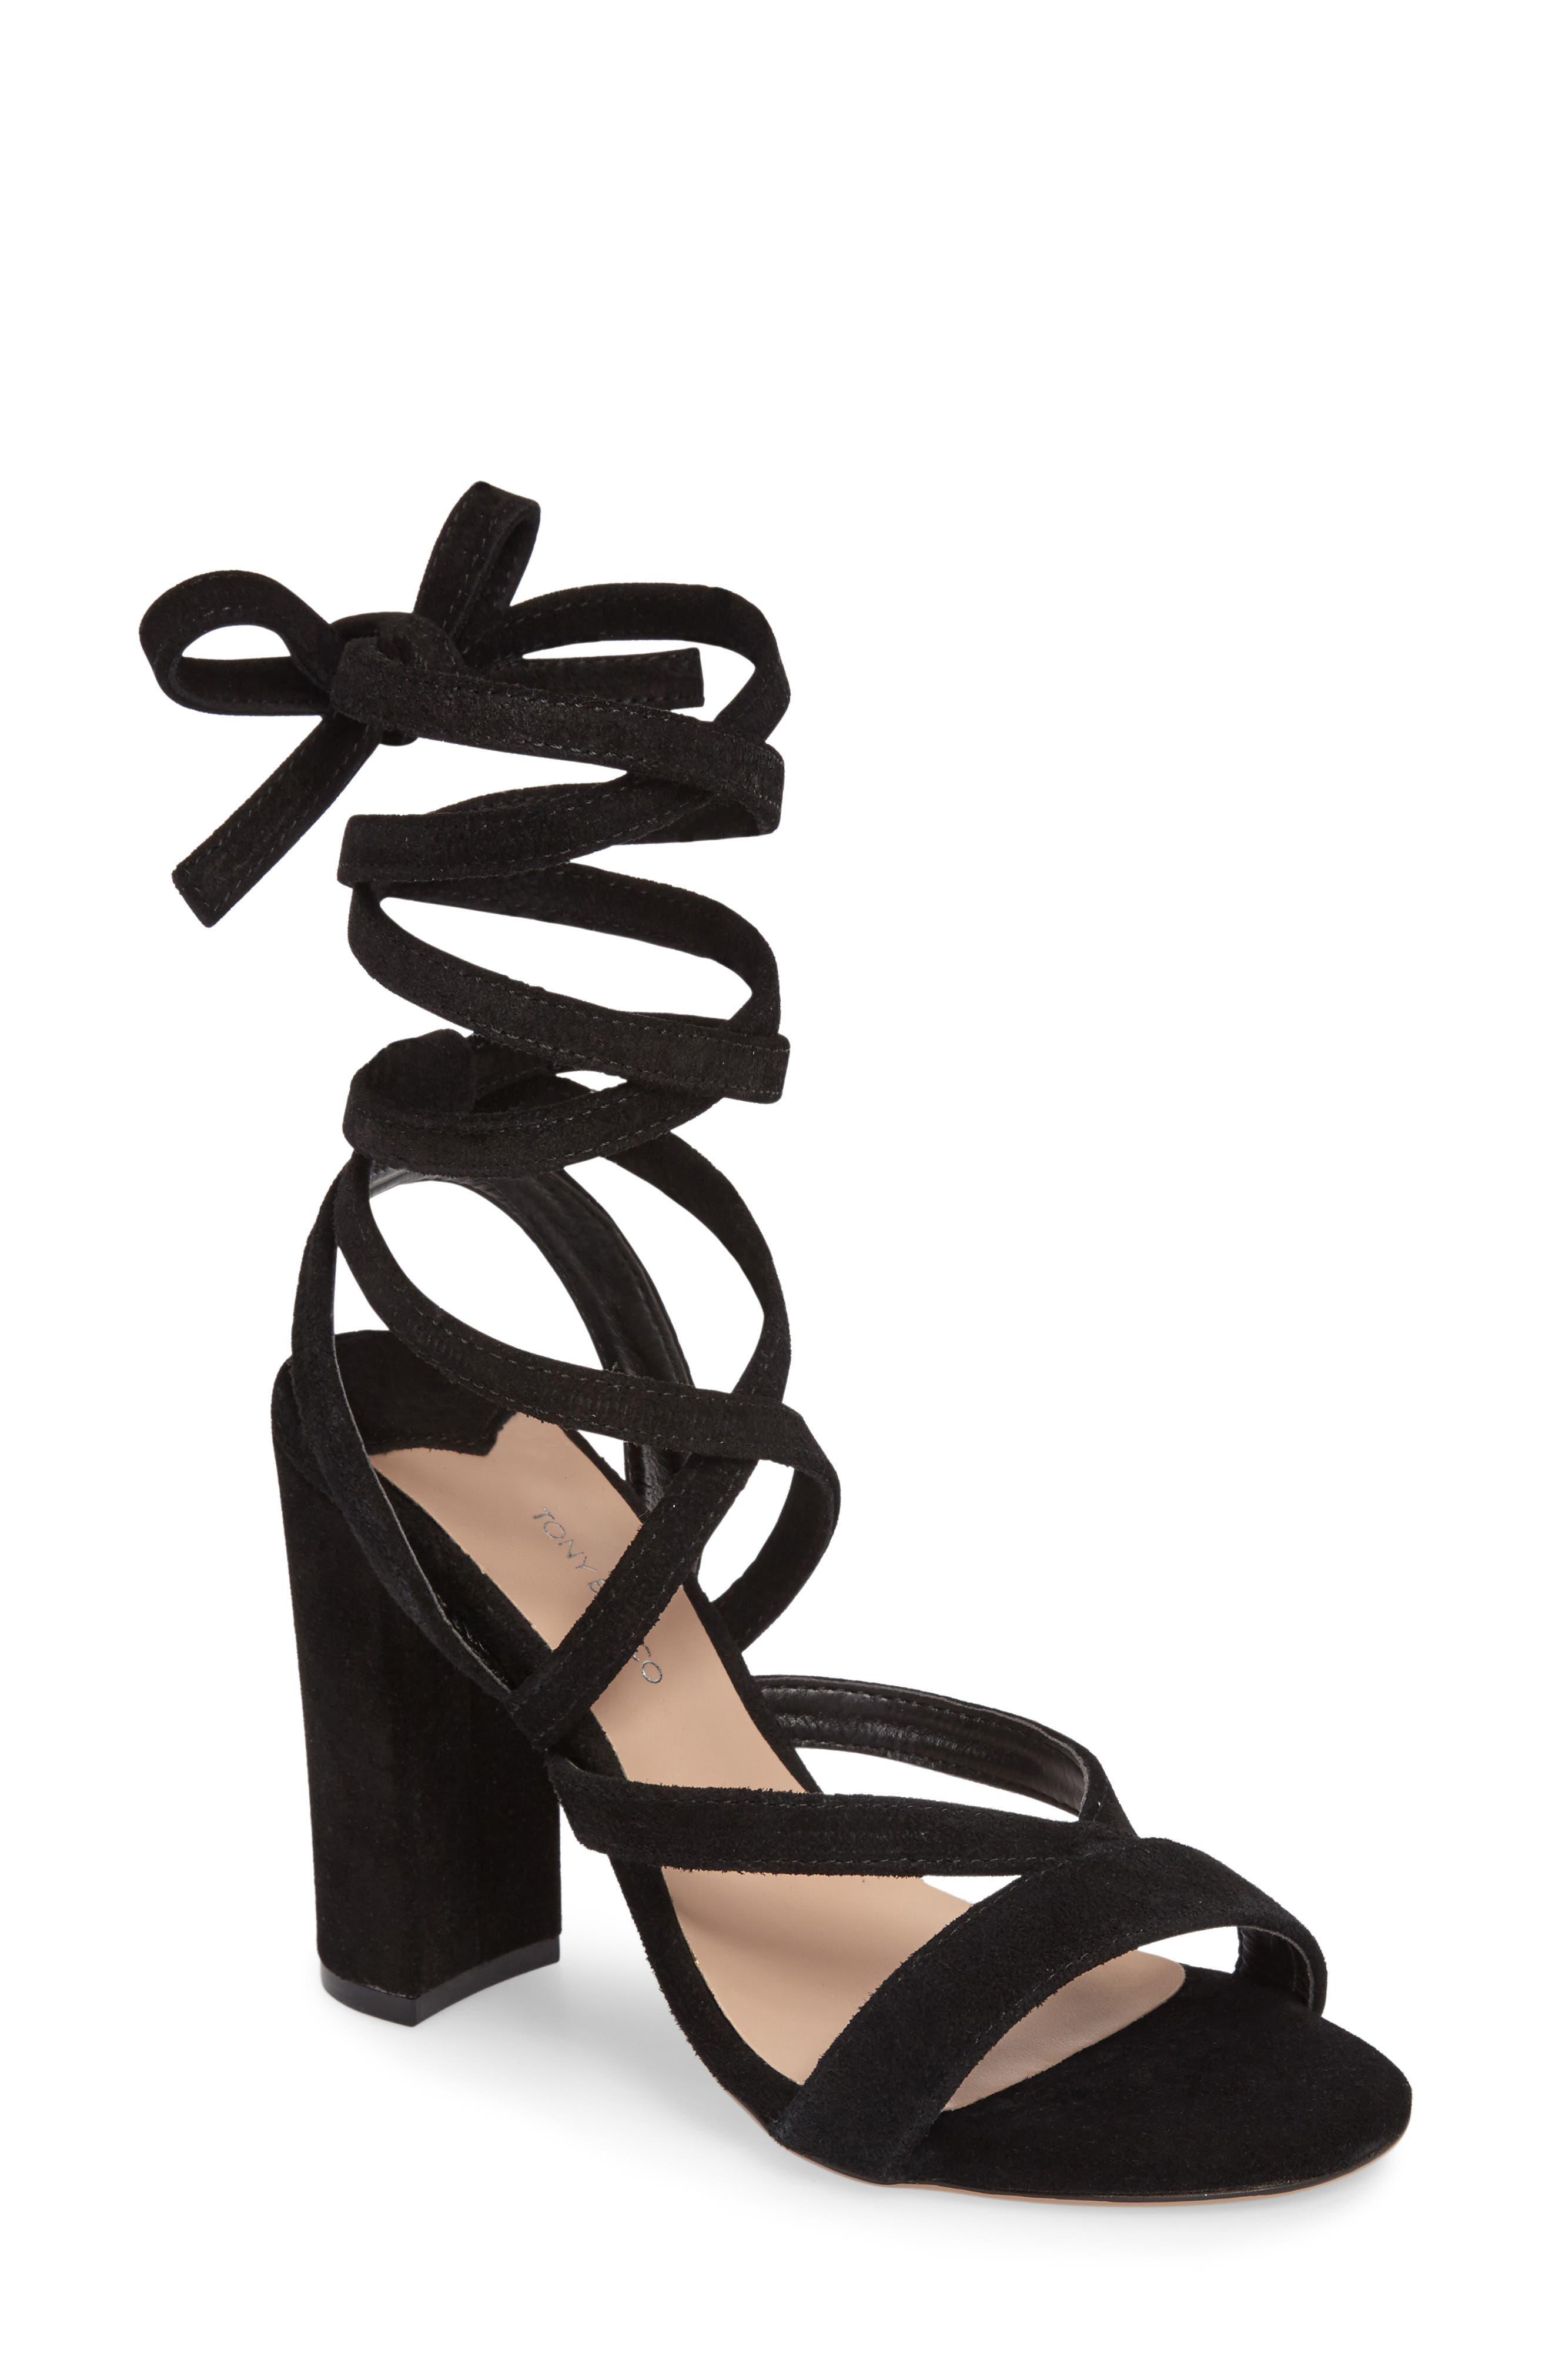 Kappa Ankle Wrap Sandal,                             Main thumbnail 1, color,                             001